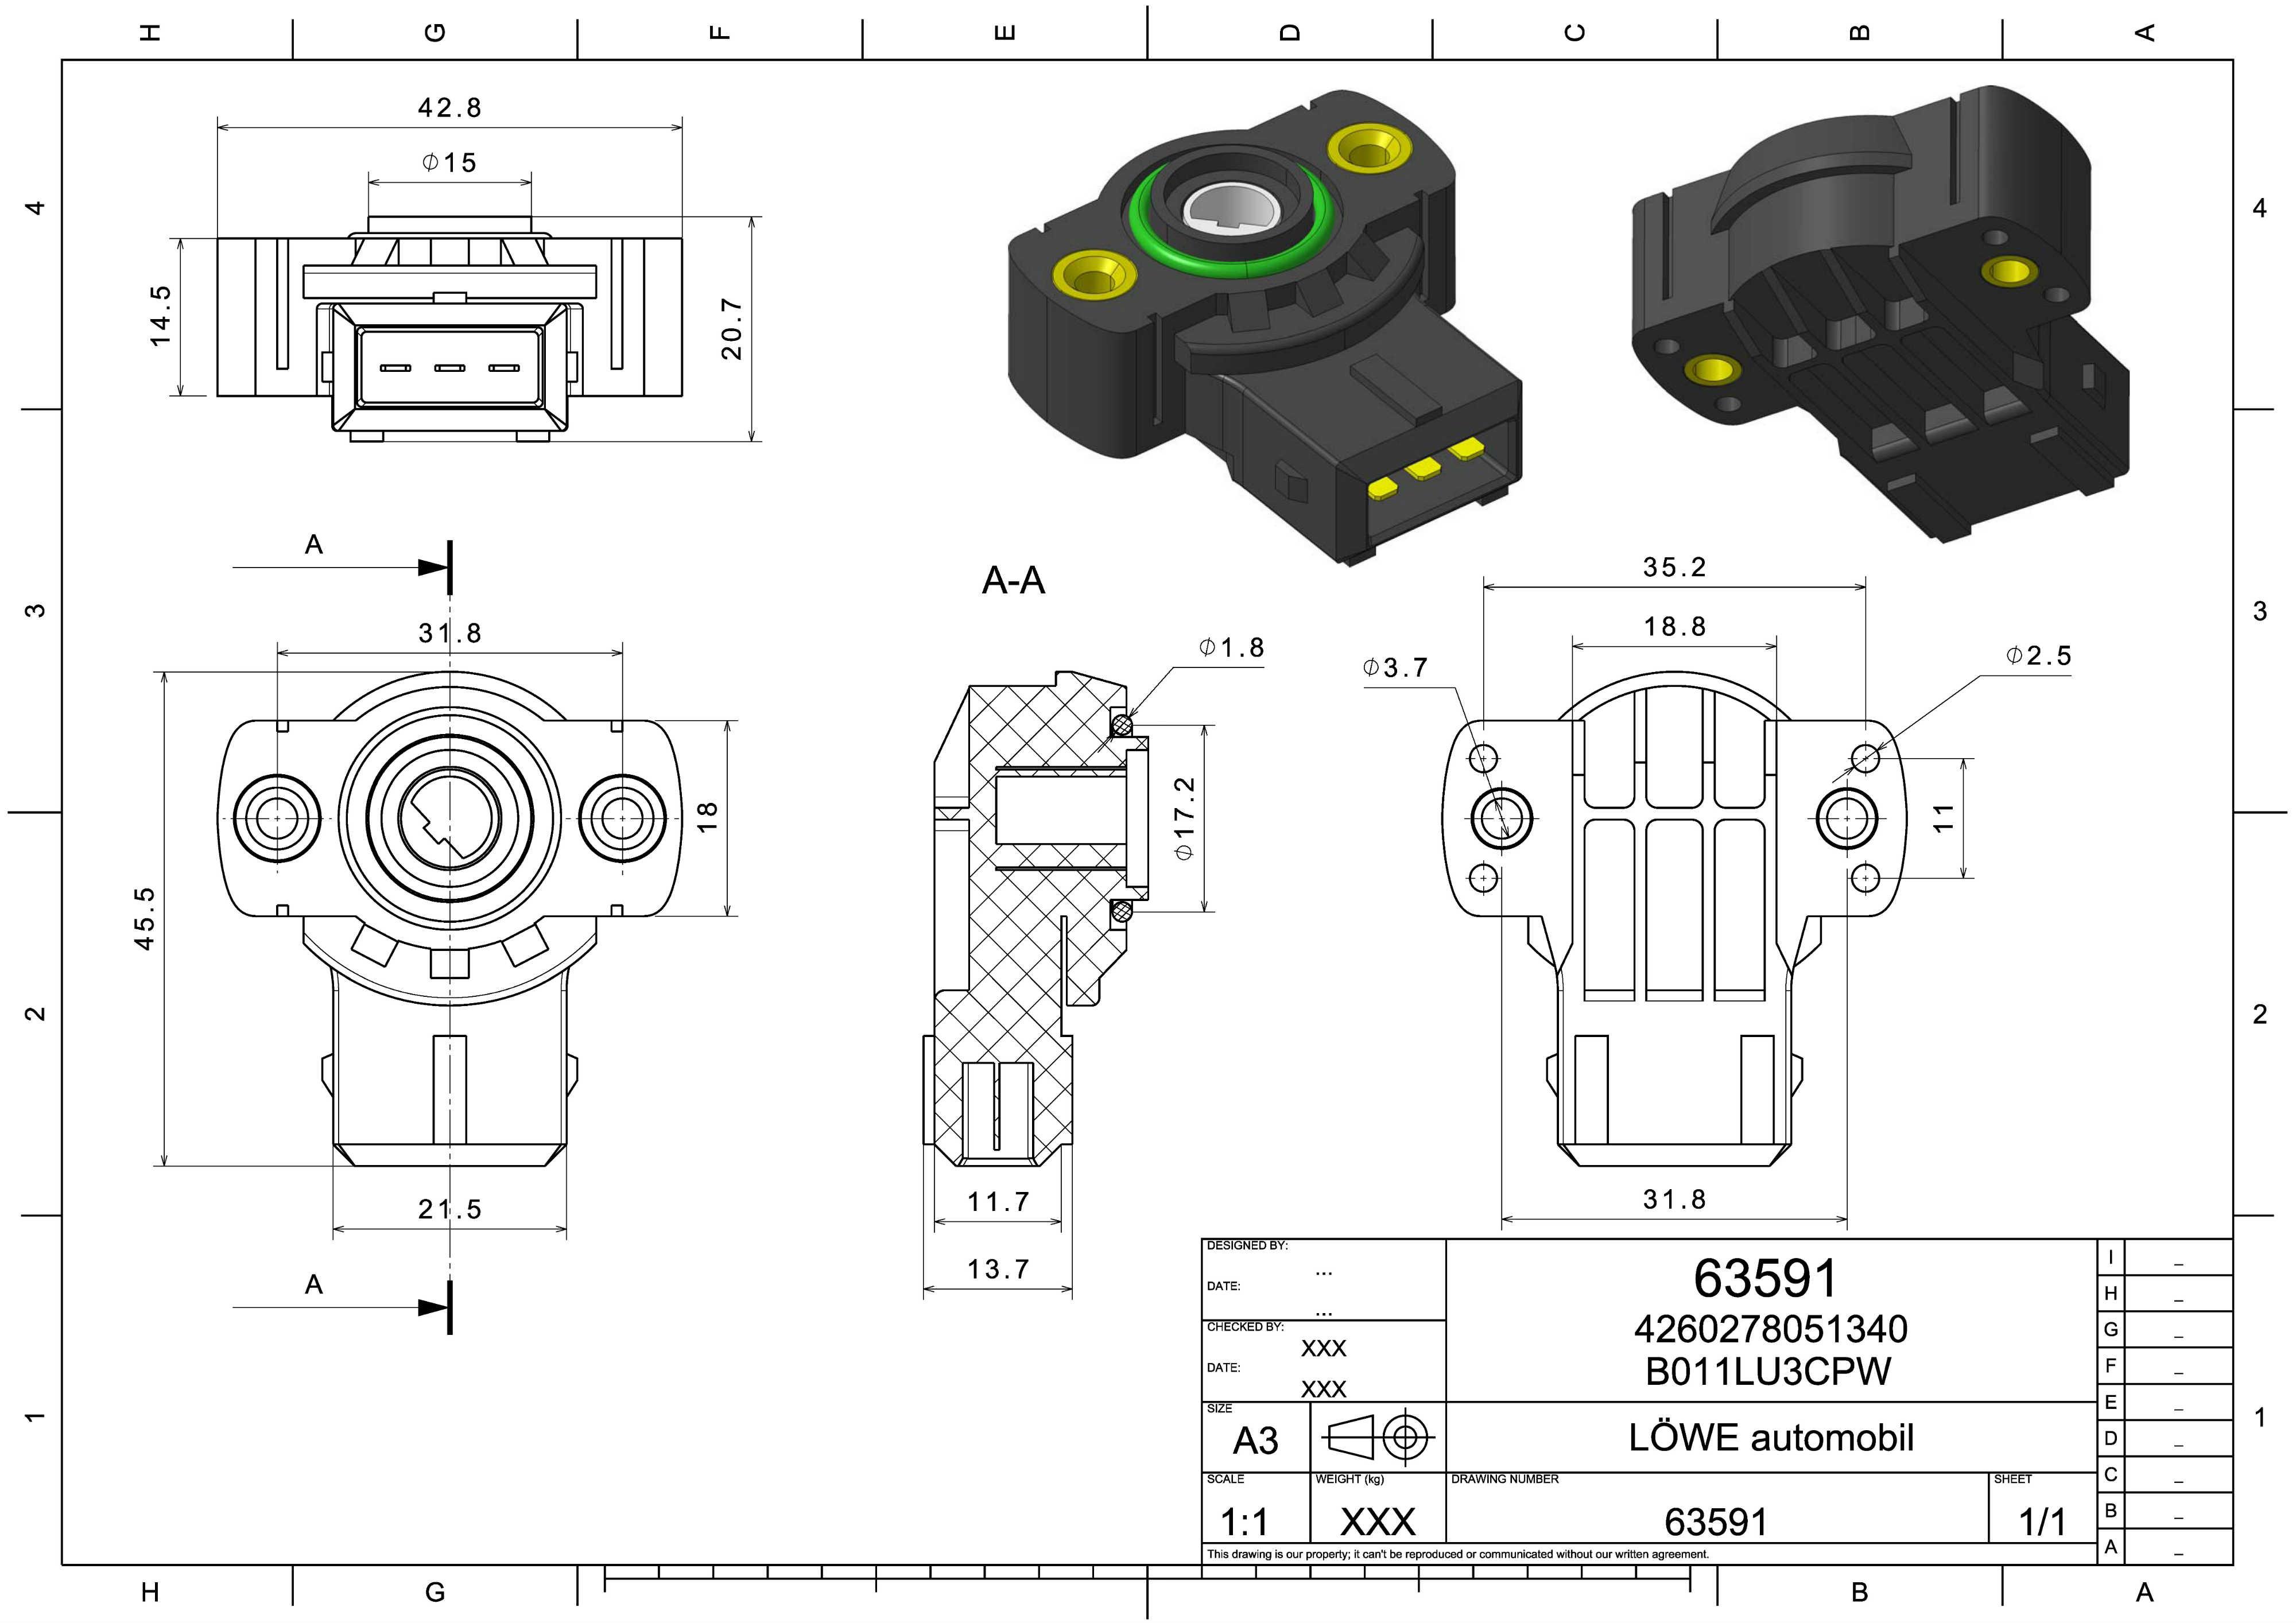 WRG-1178] 2004 Mustang Tps Wiring Diagram on